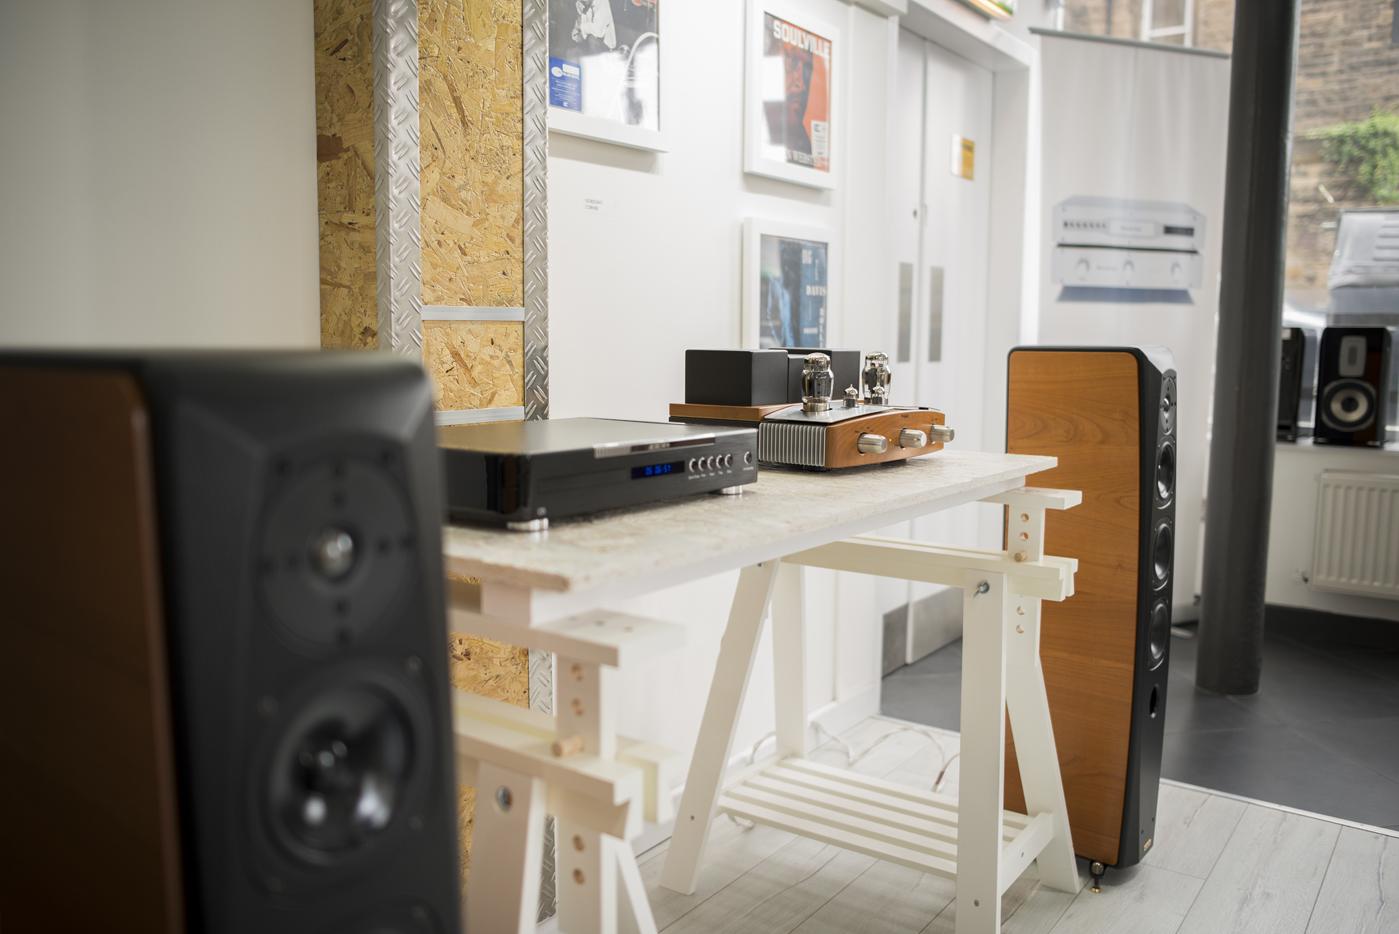 Aurum C5 CD Player Unison Research Preludio Integrated Valve Amplifier Opera Grand Mezza Speakers